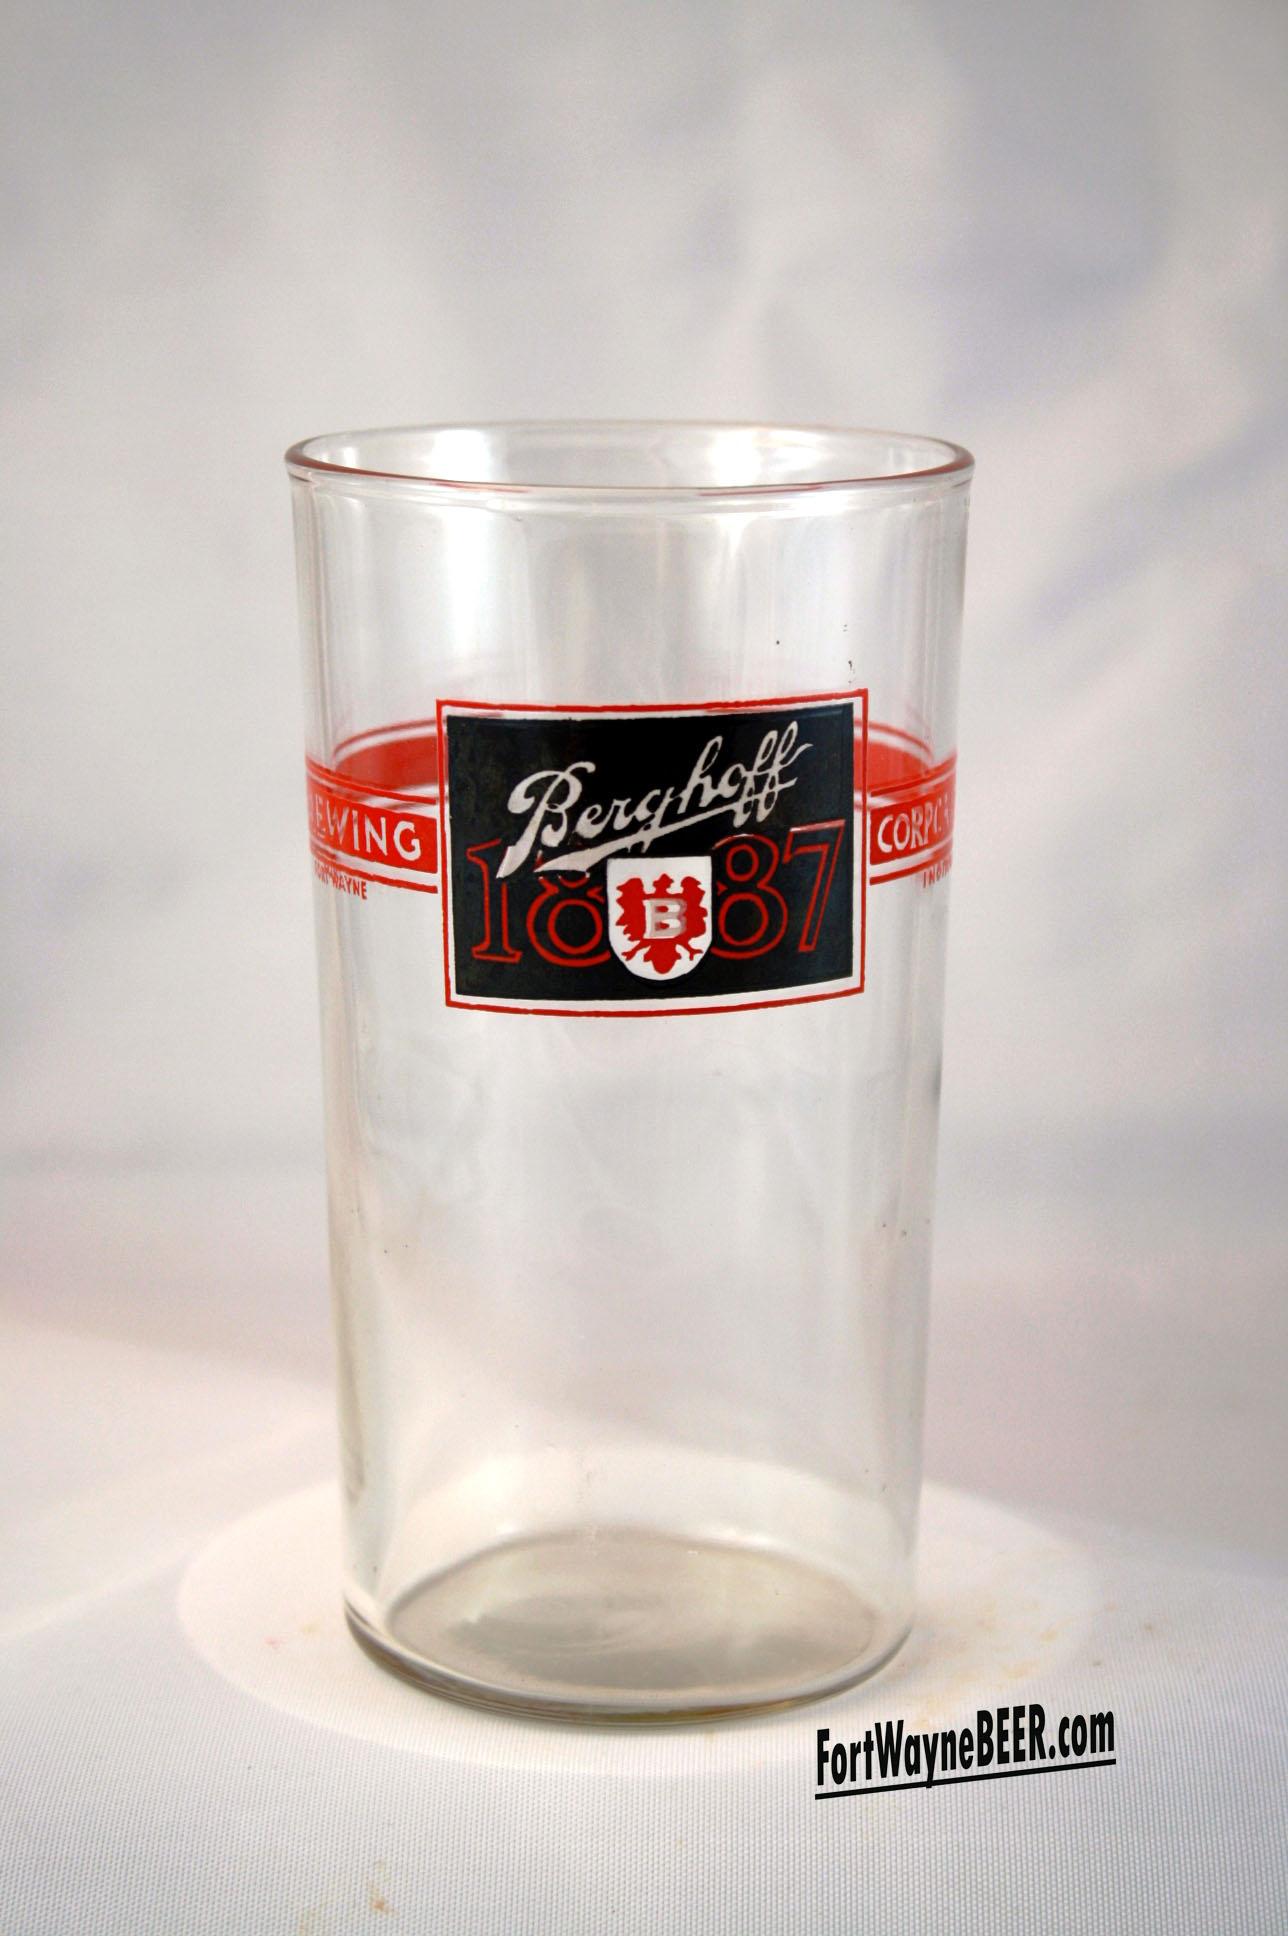 Berghoff Glass1 copy.jpg